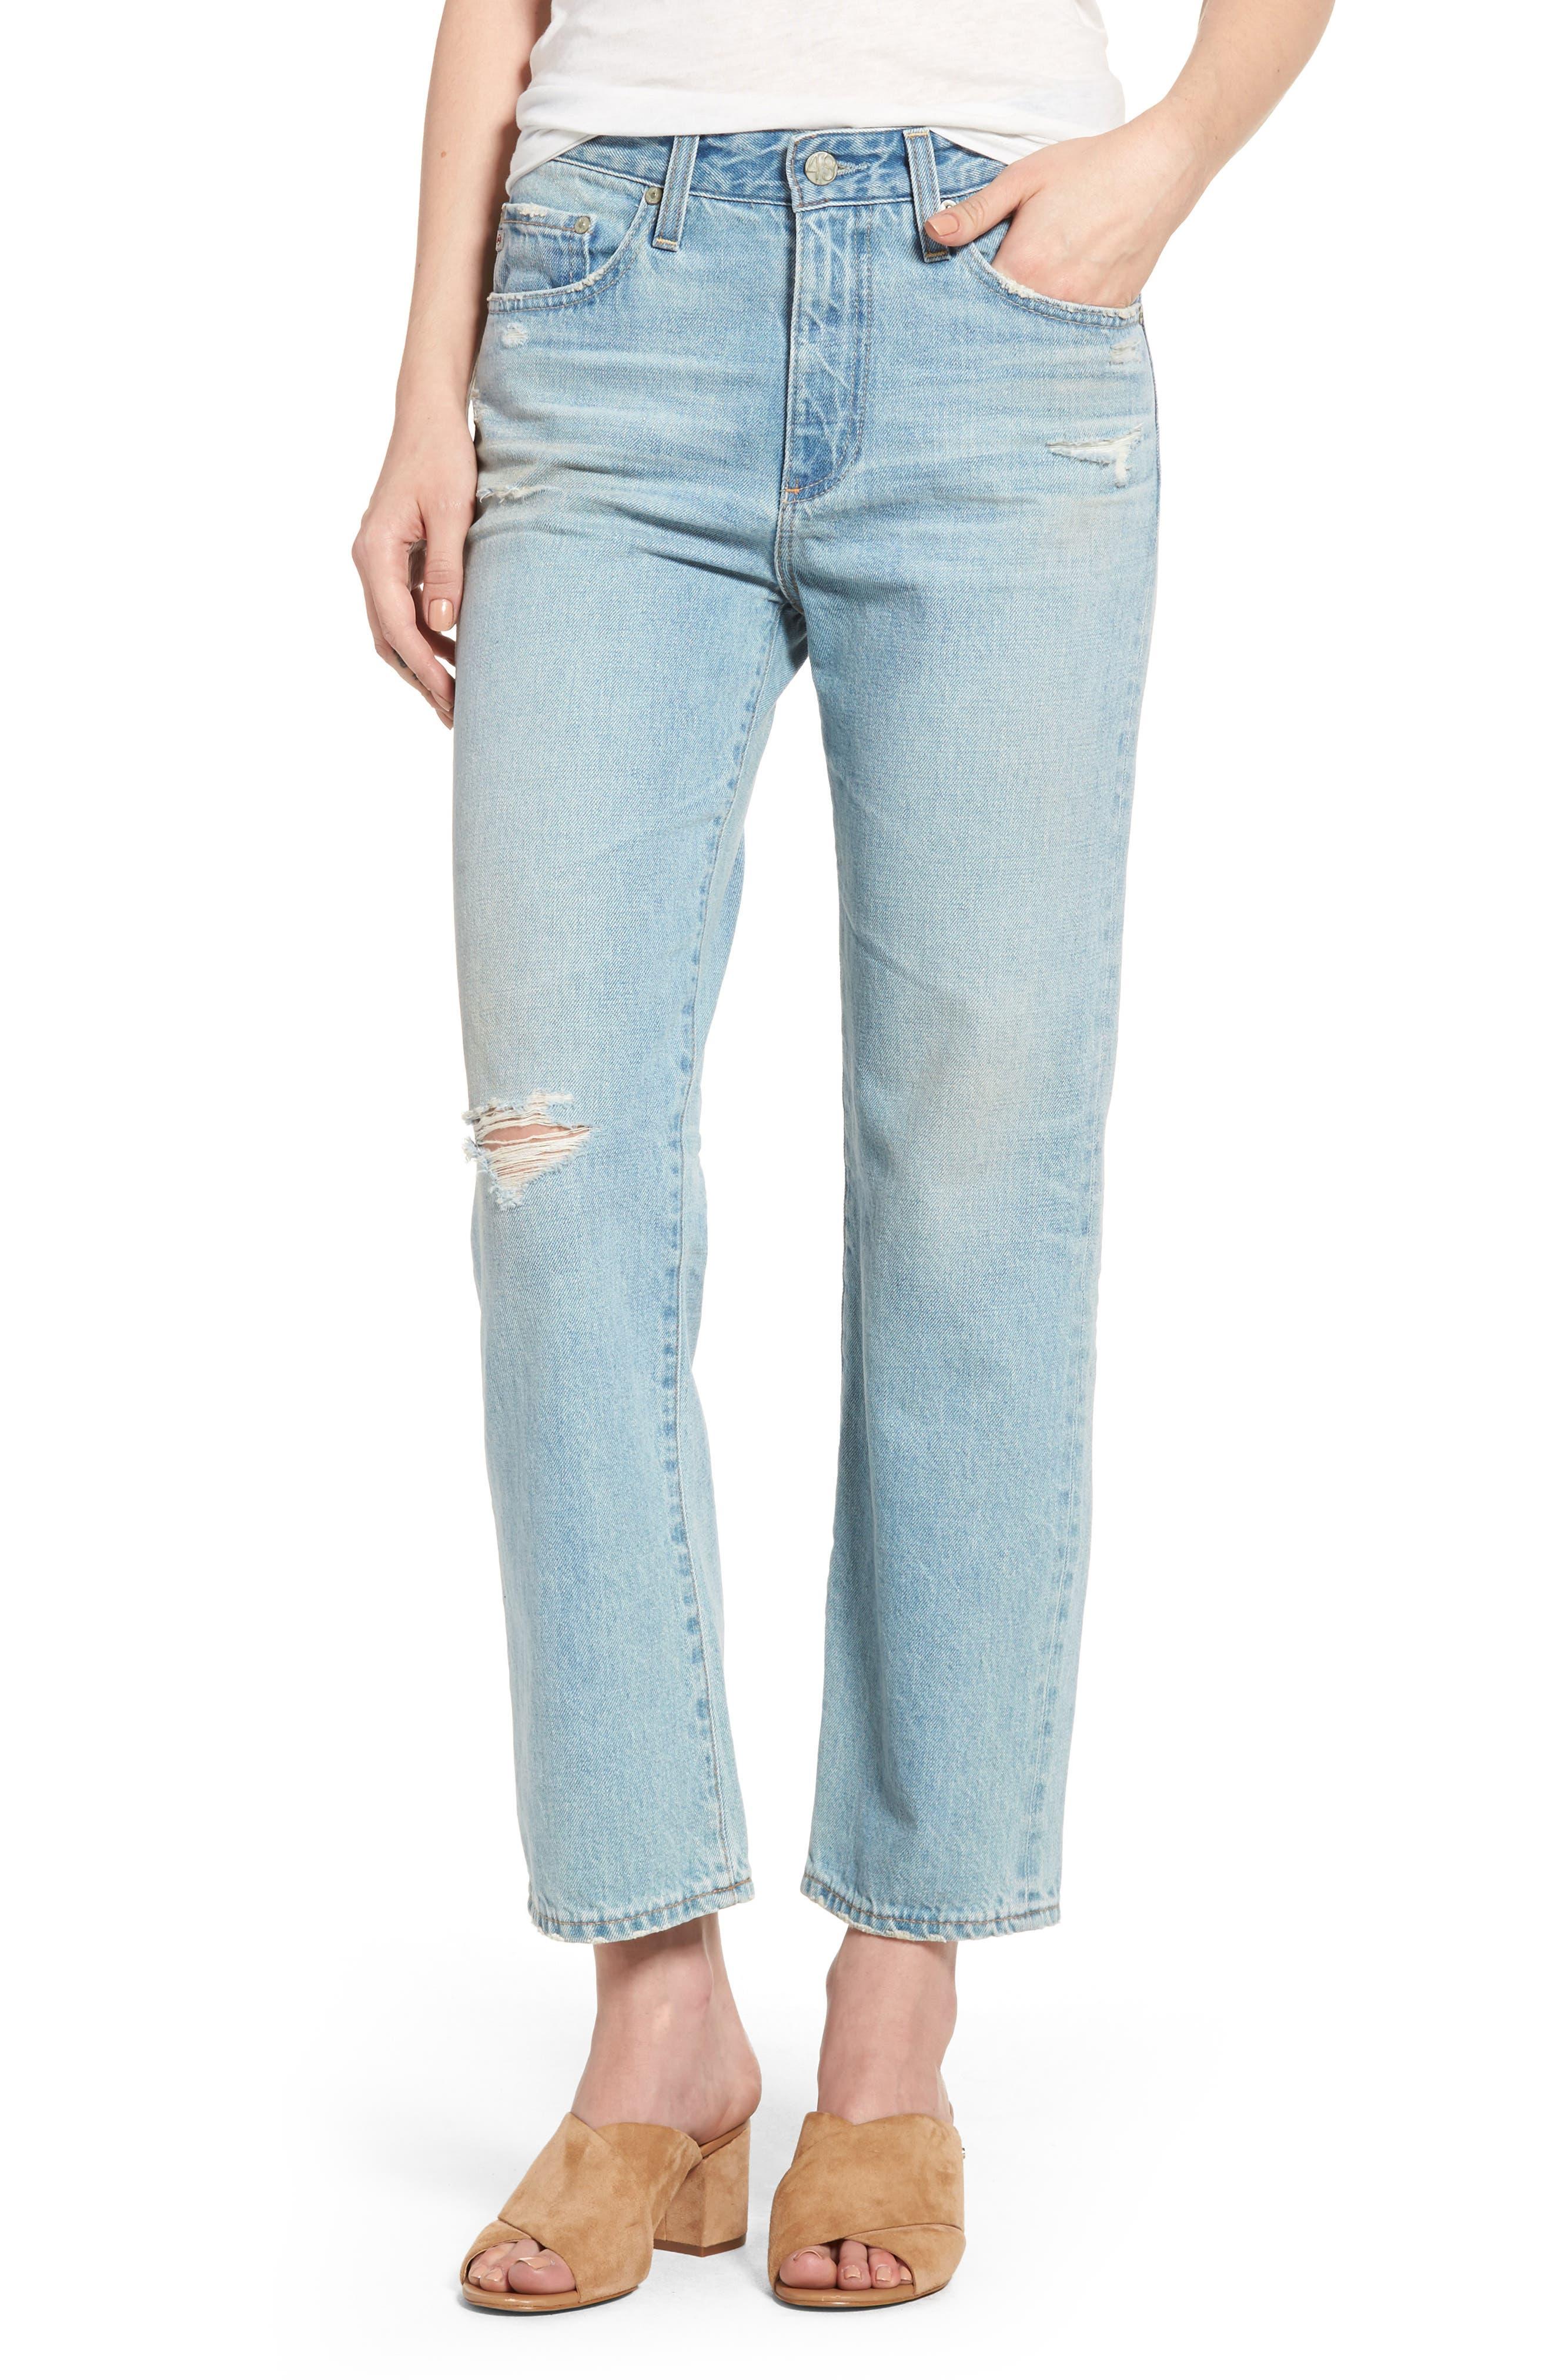 The Rhett Vintage High Waist Crop Jeans,                         Main,                         color, 21 Years Cades Blue